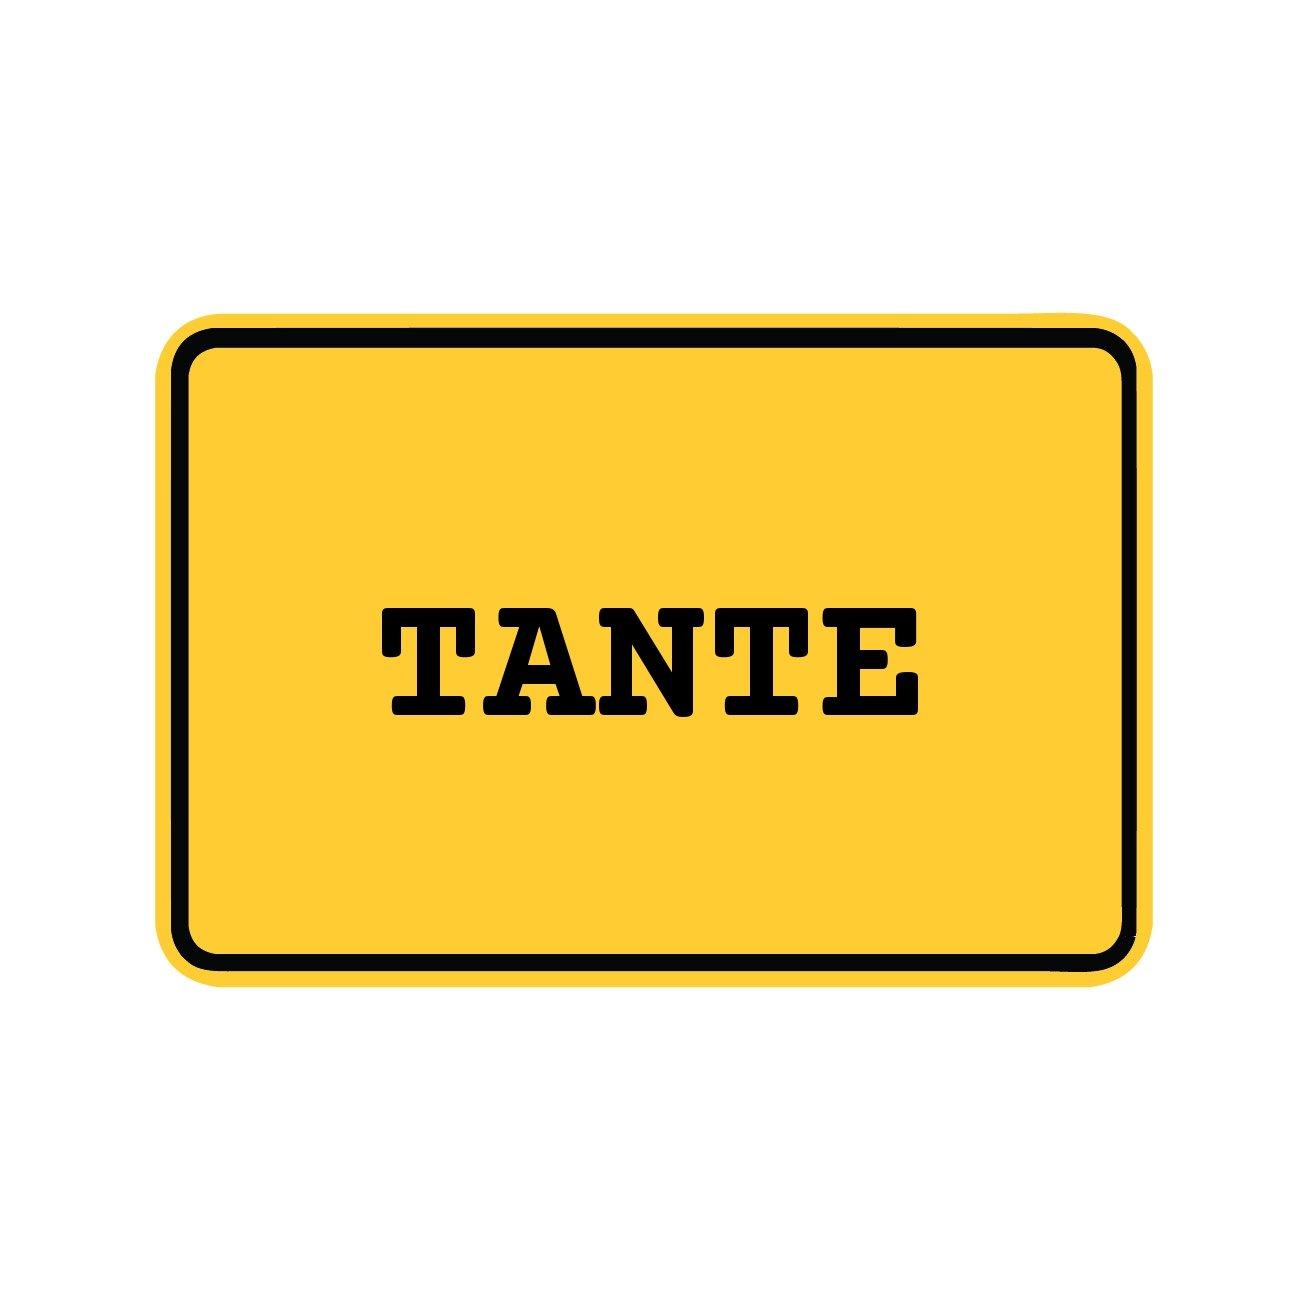 Design Kleeblatt Farbe Tante JOllify Aufkleber